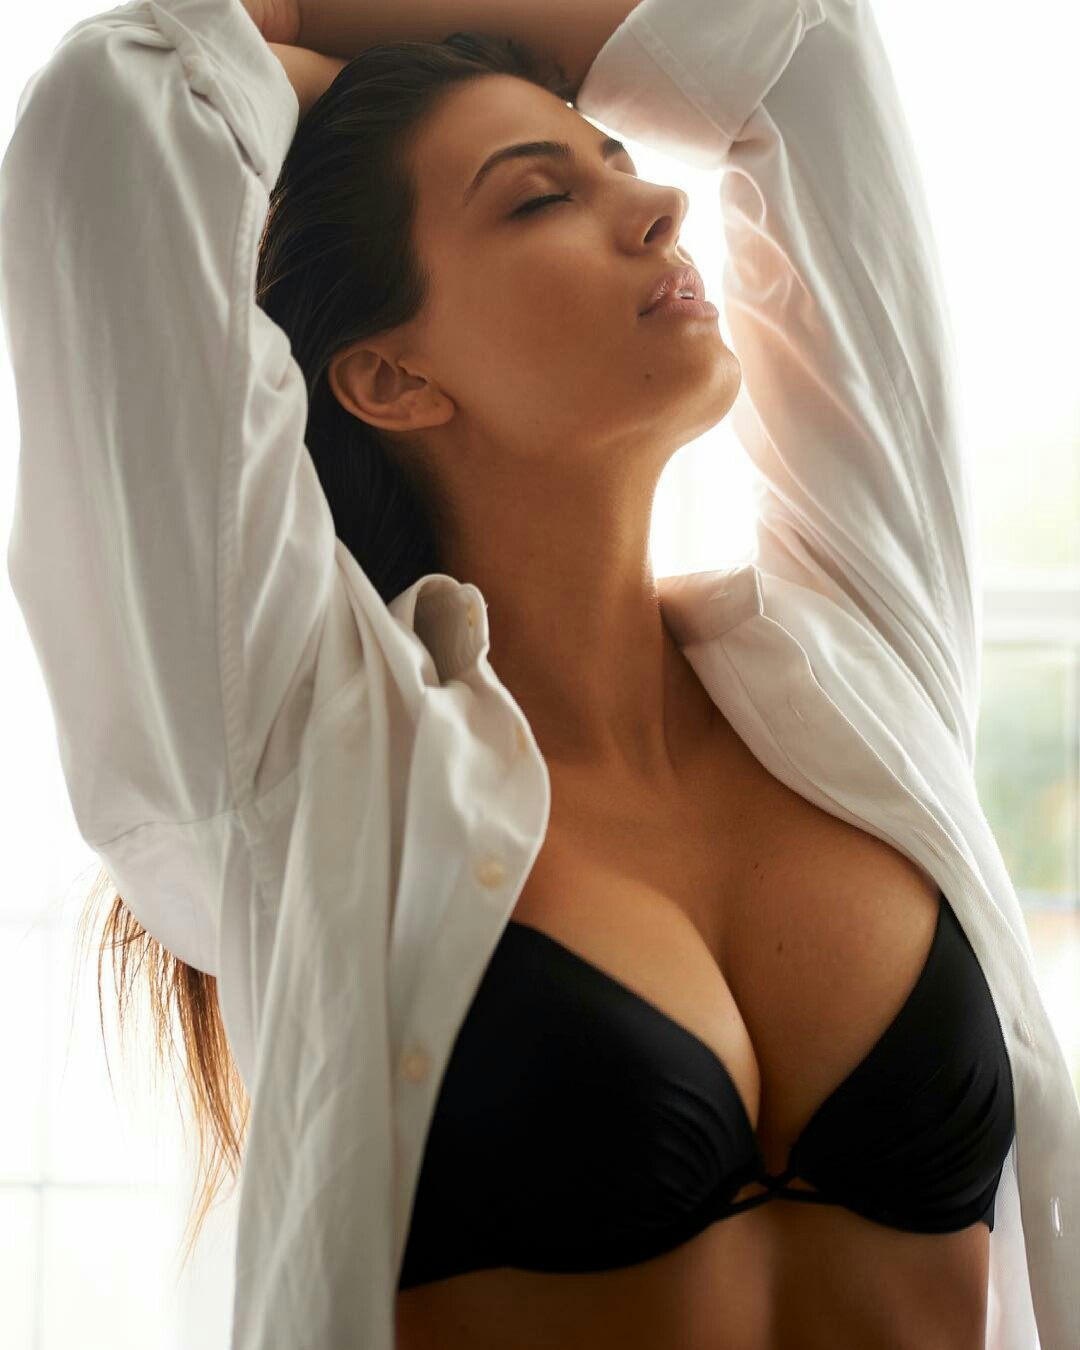 Nevena Krstic hot photoshoot HD photos, gallery